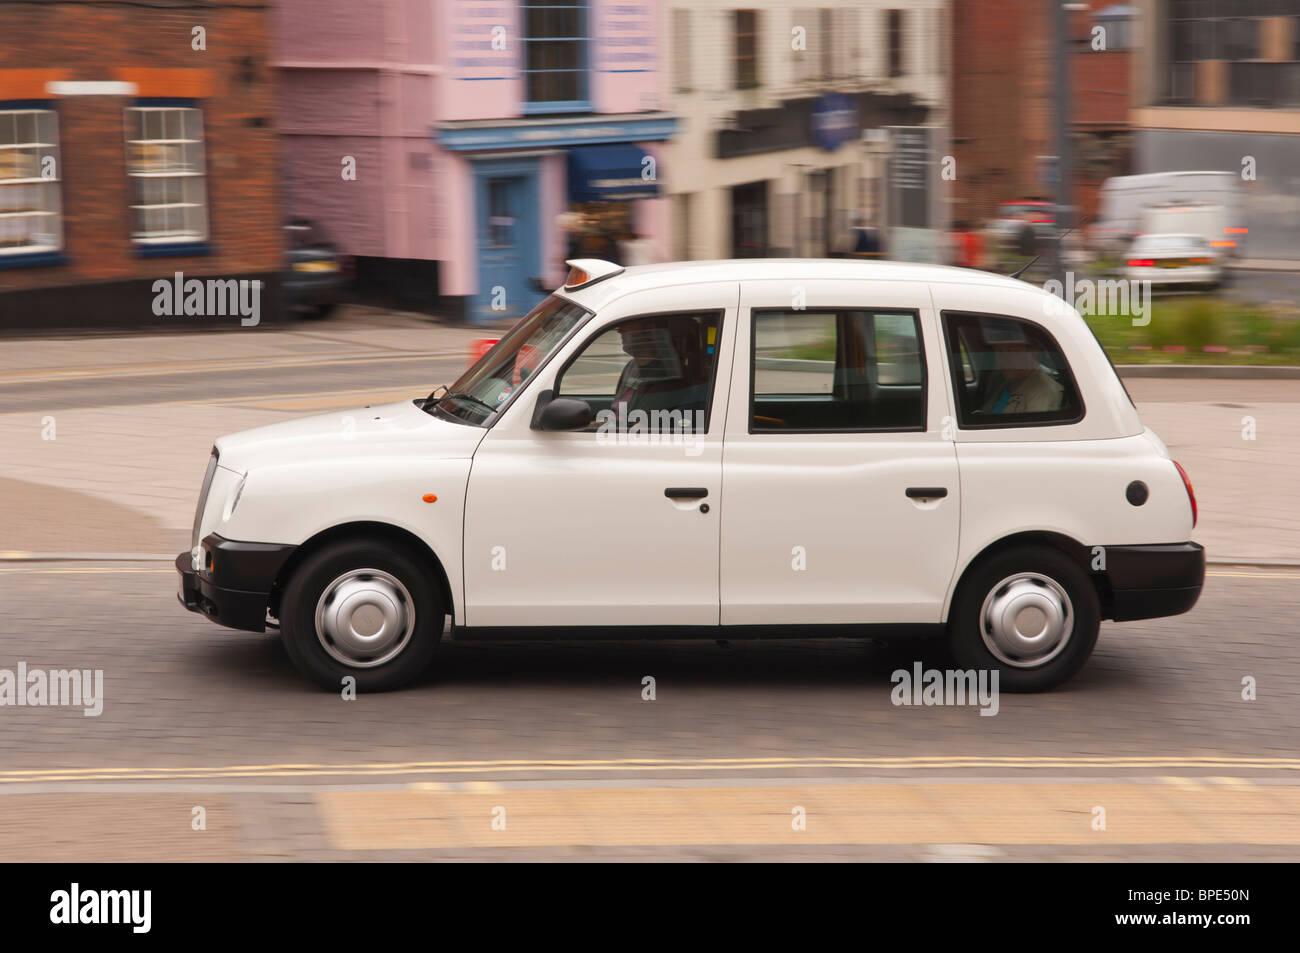 white london cab stockfotos white london cab bilder alamy. Black Bedroom Furniture Sets. Home Design Ideas